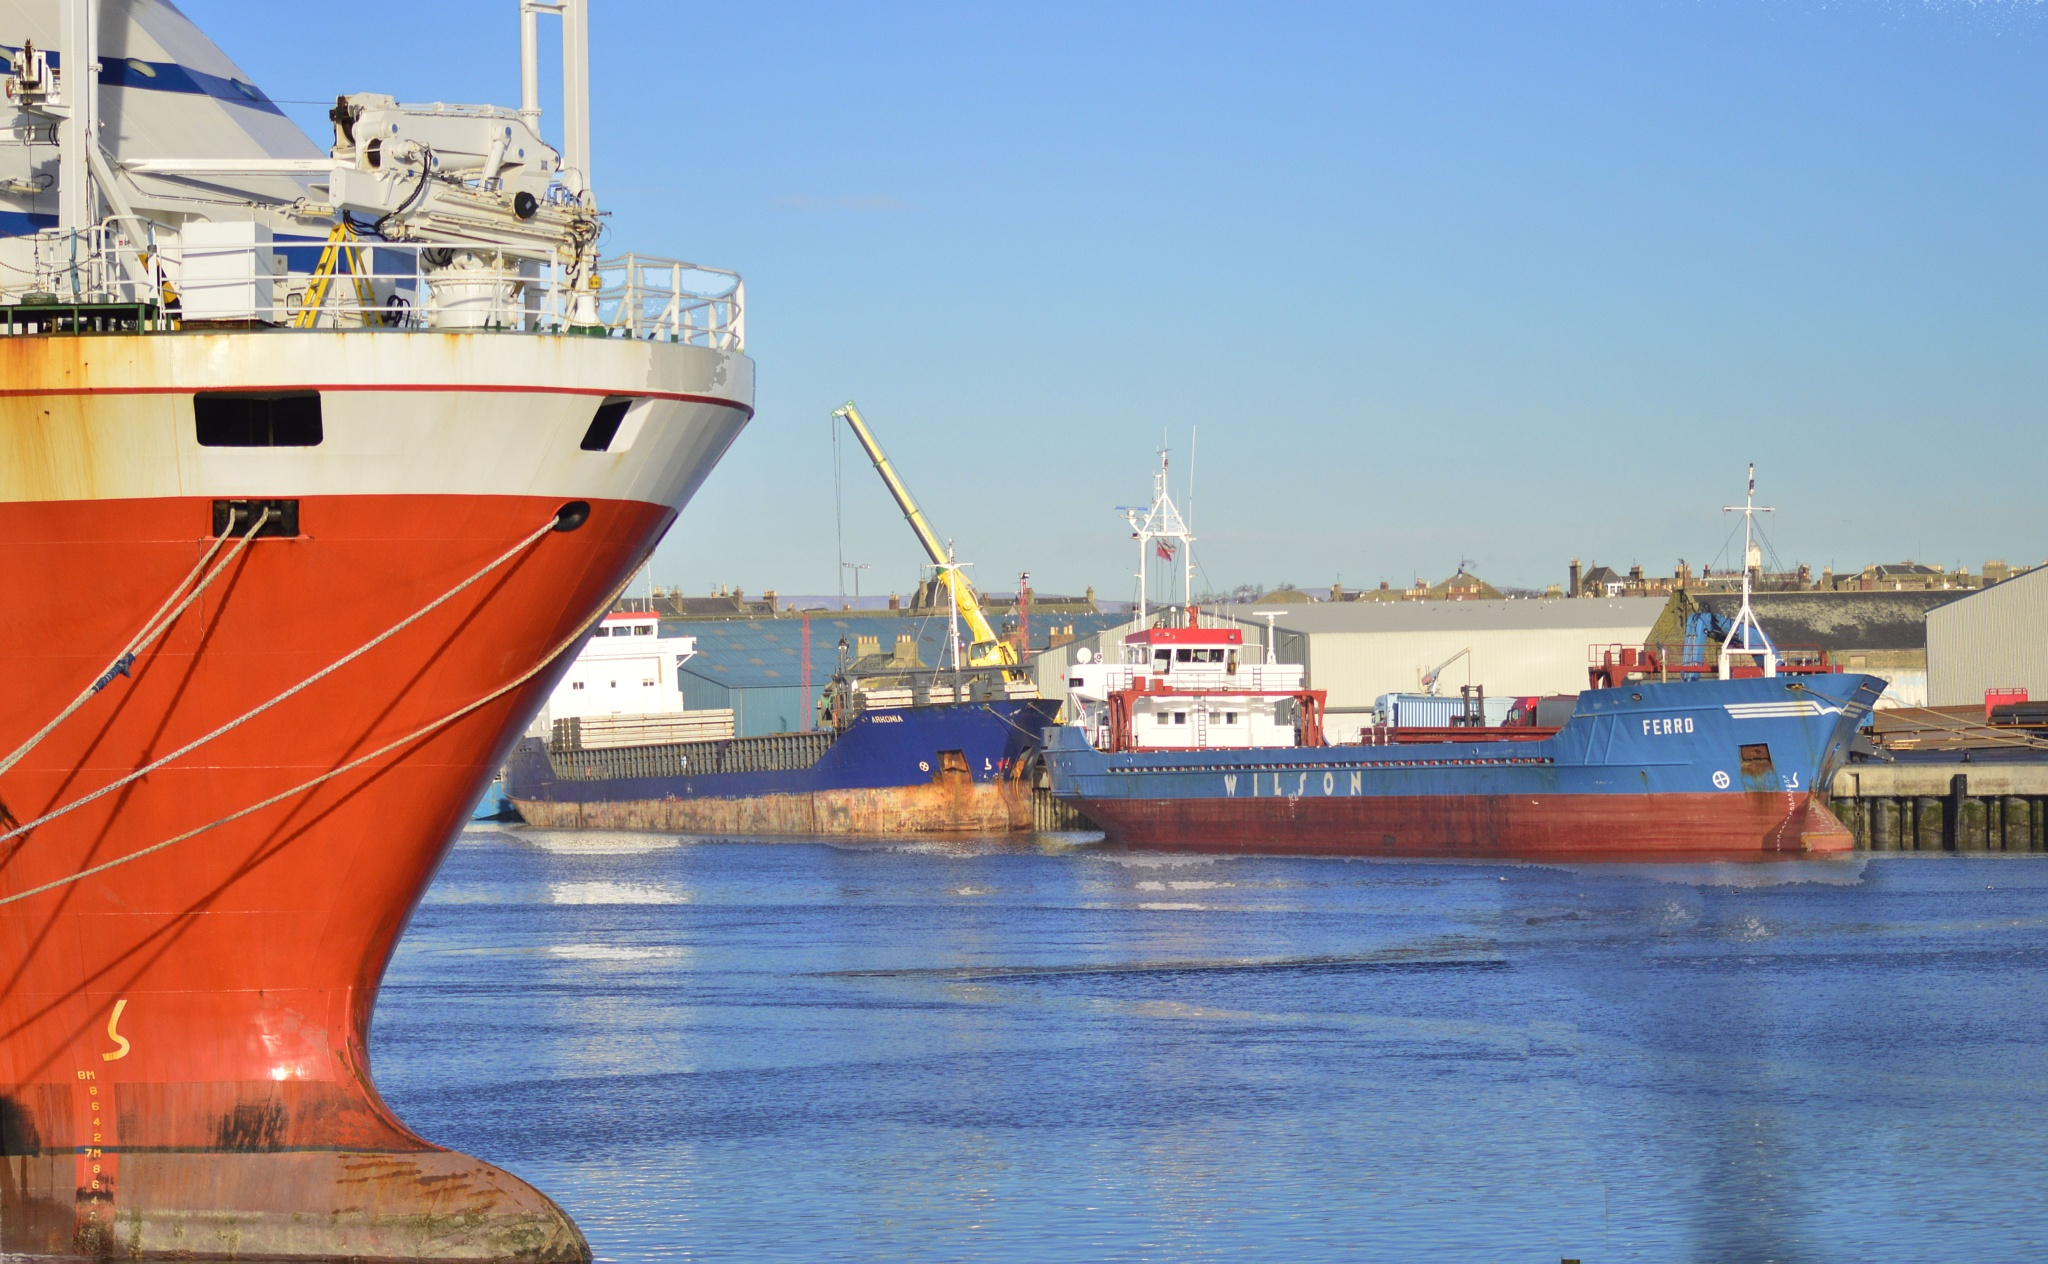 Harbour by John White